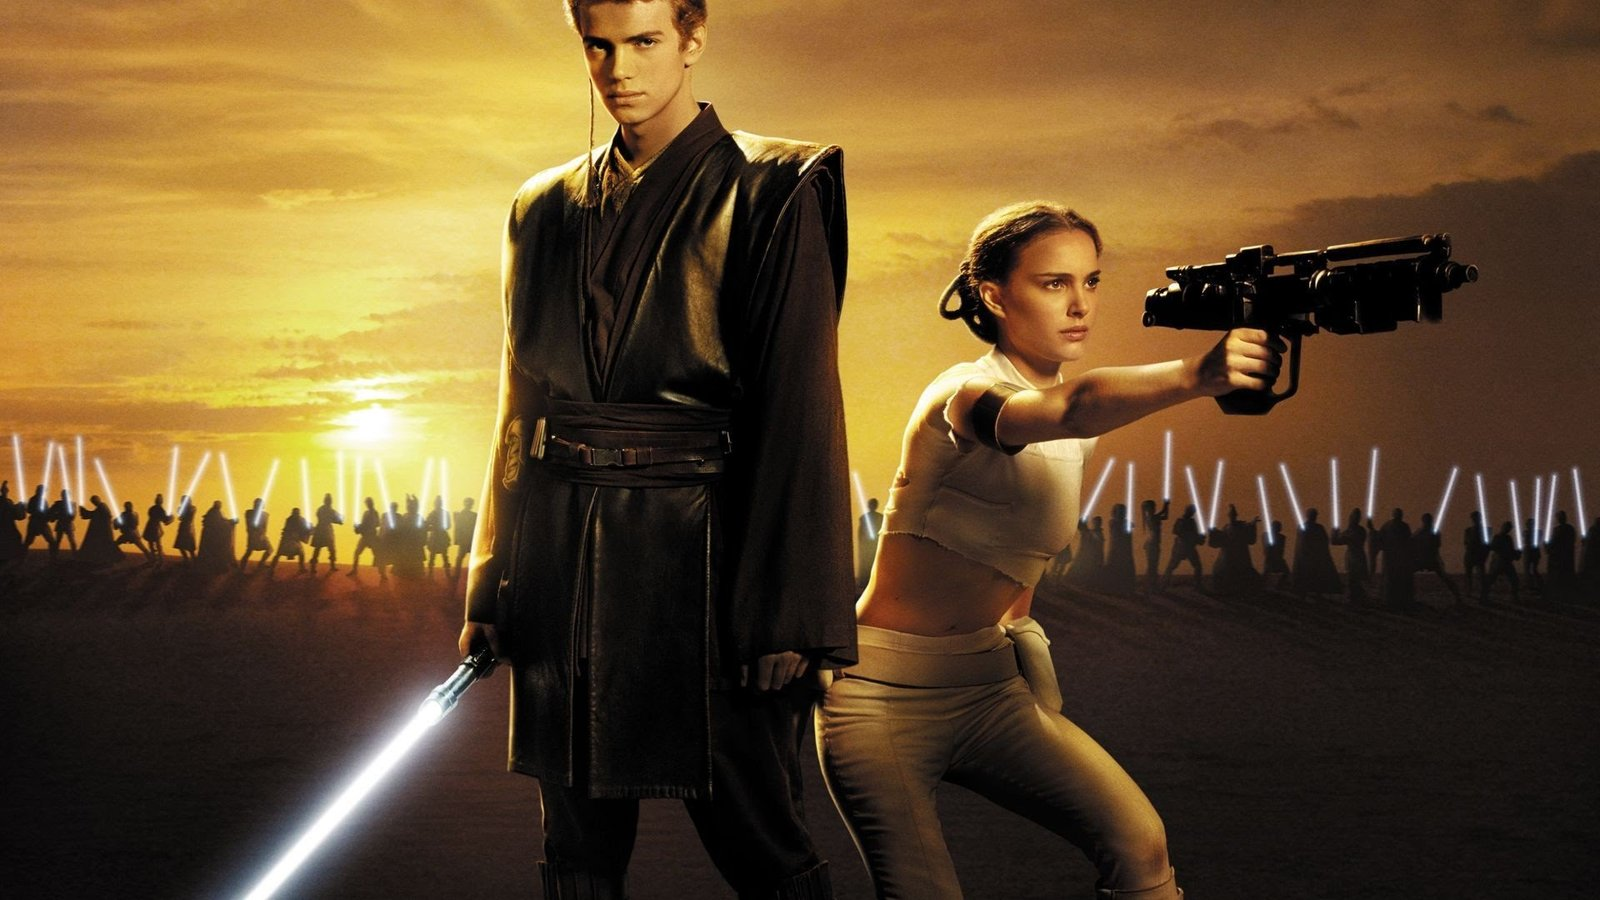 / Star Wars: Episode II - Attack of the Clones